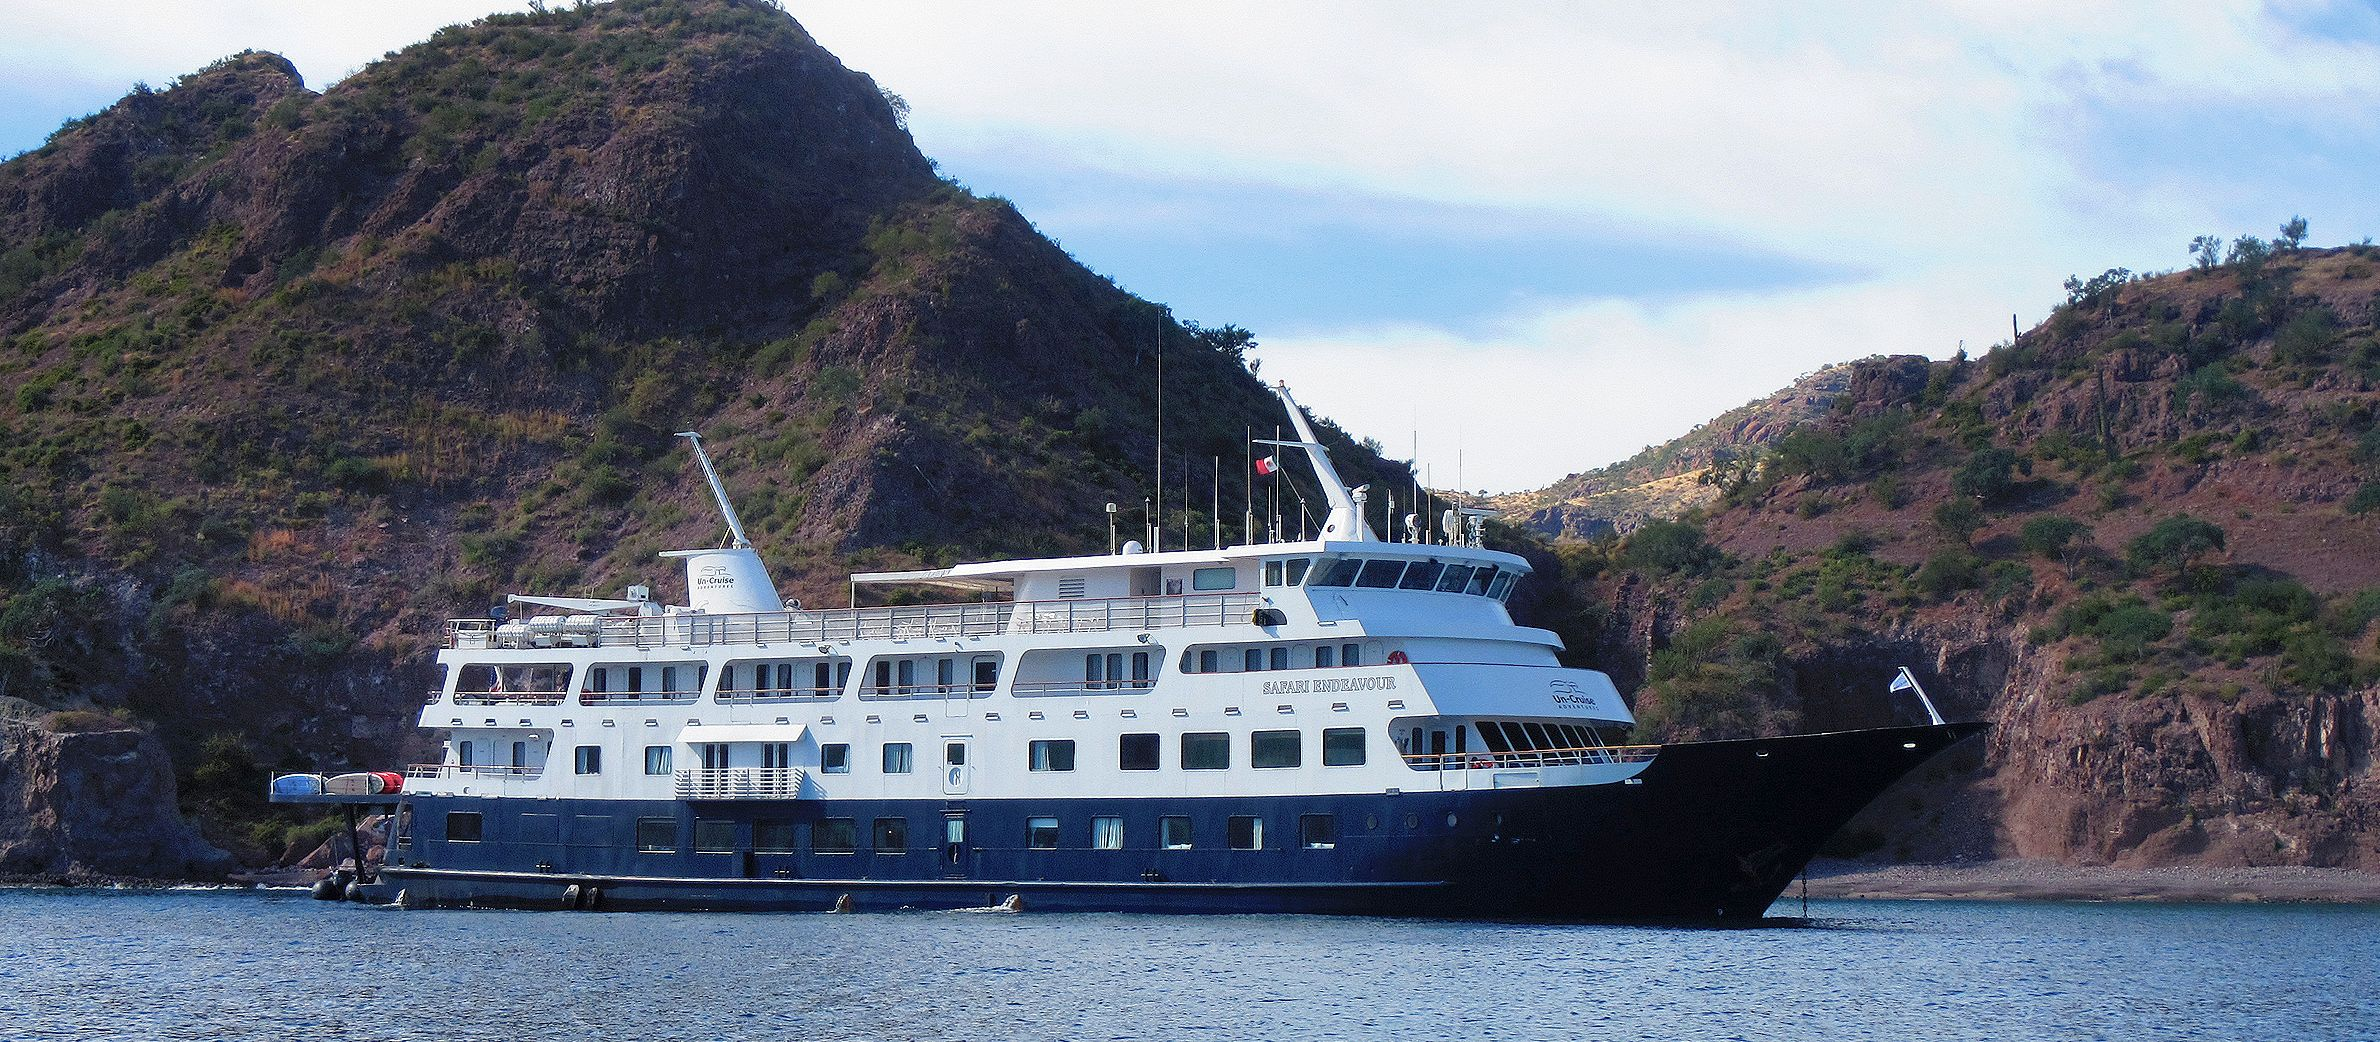 Das Safari Endeavour Schiff der UnCruise Adventures während der Mexico's Sea of Cortés Tour